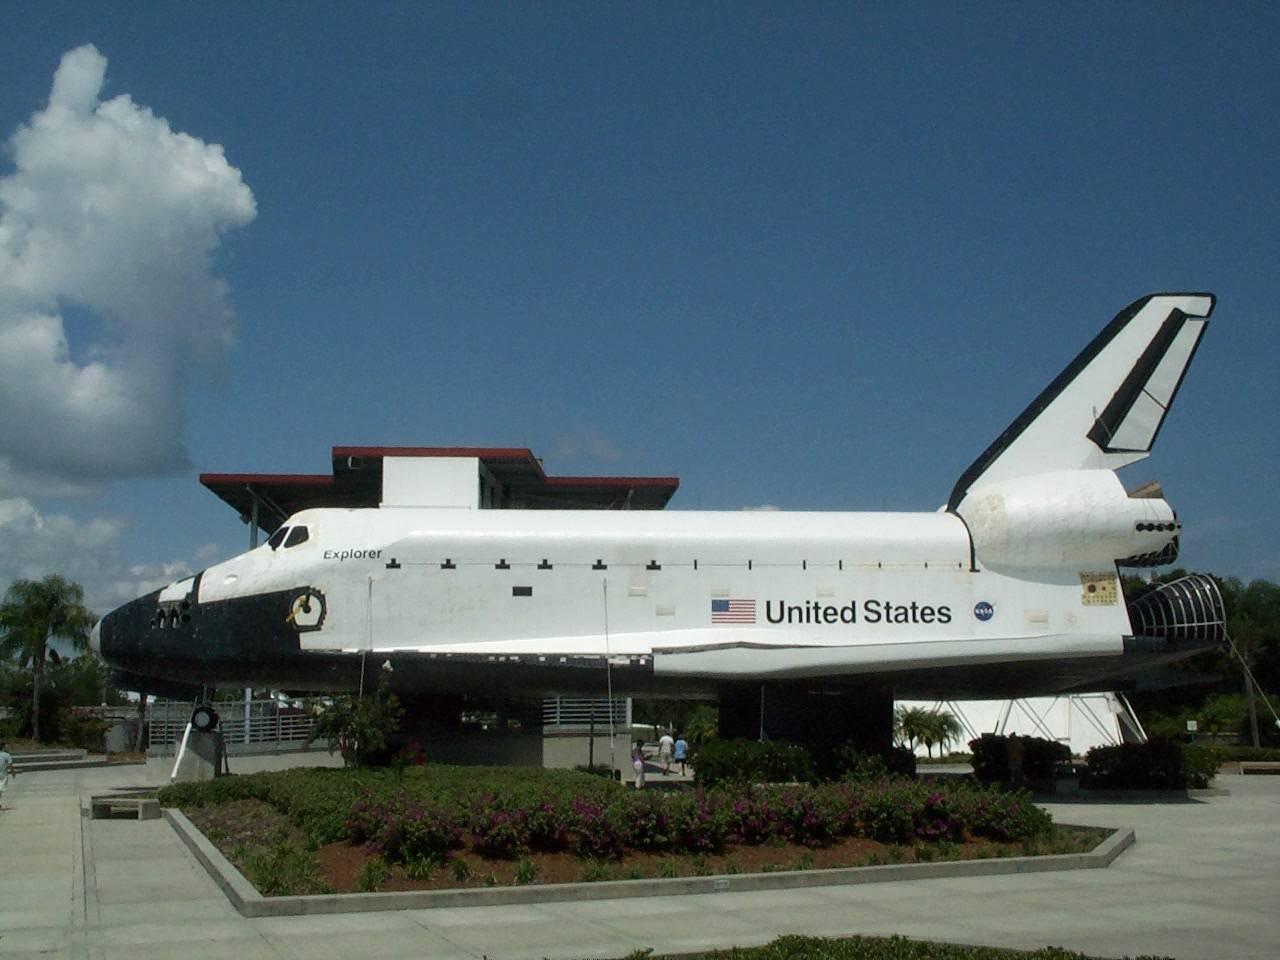 space shuttle orbiter - photo #5